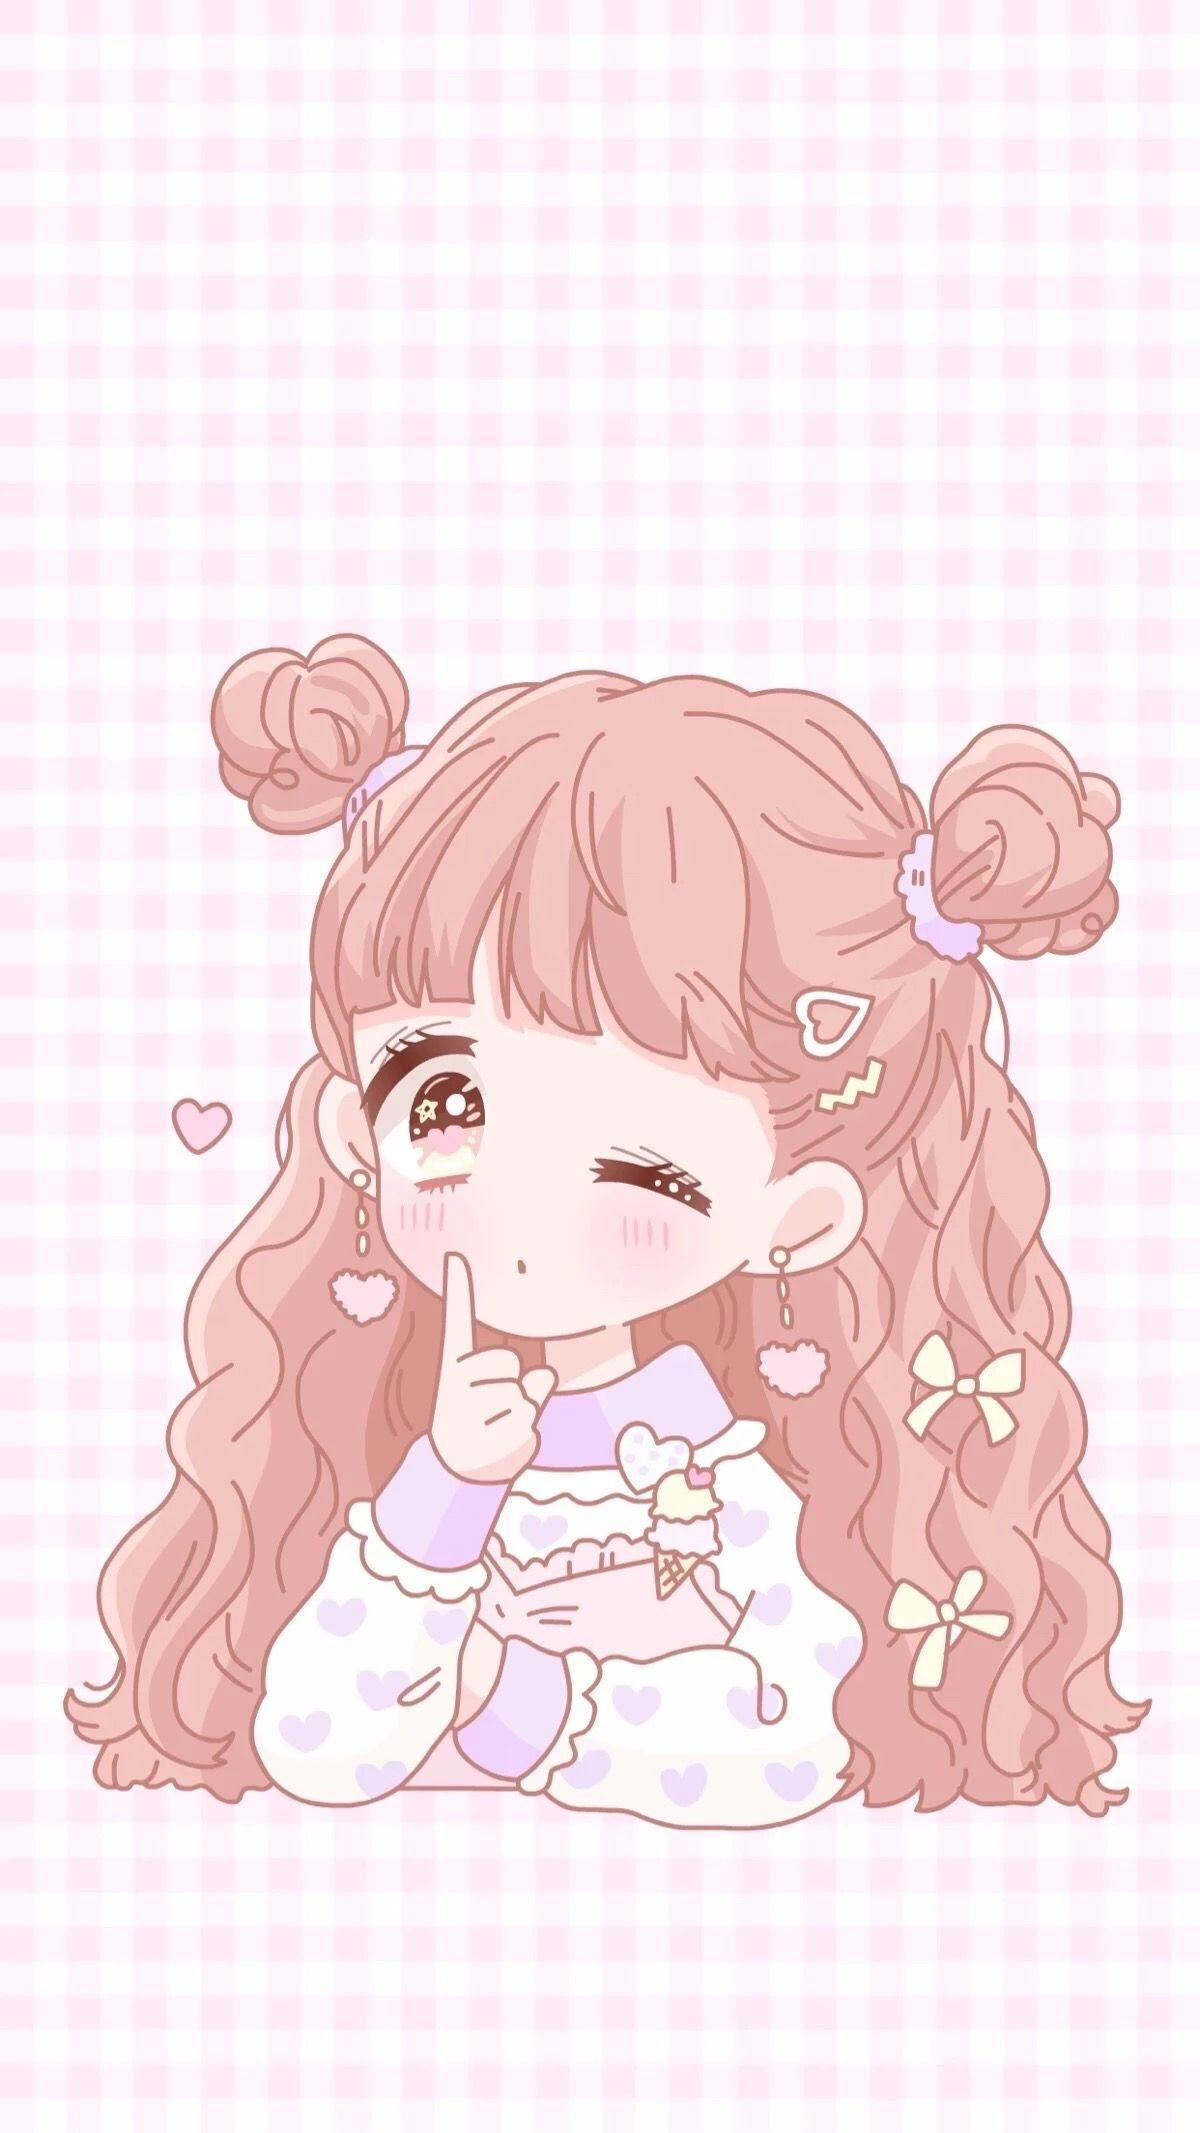 Cute Kawaii Anime Wallpaper : kawaii, anime, wallpaper, Anime, Kawaii, Wallpapers, Wallpaper